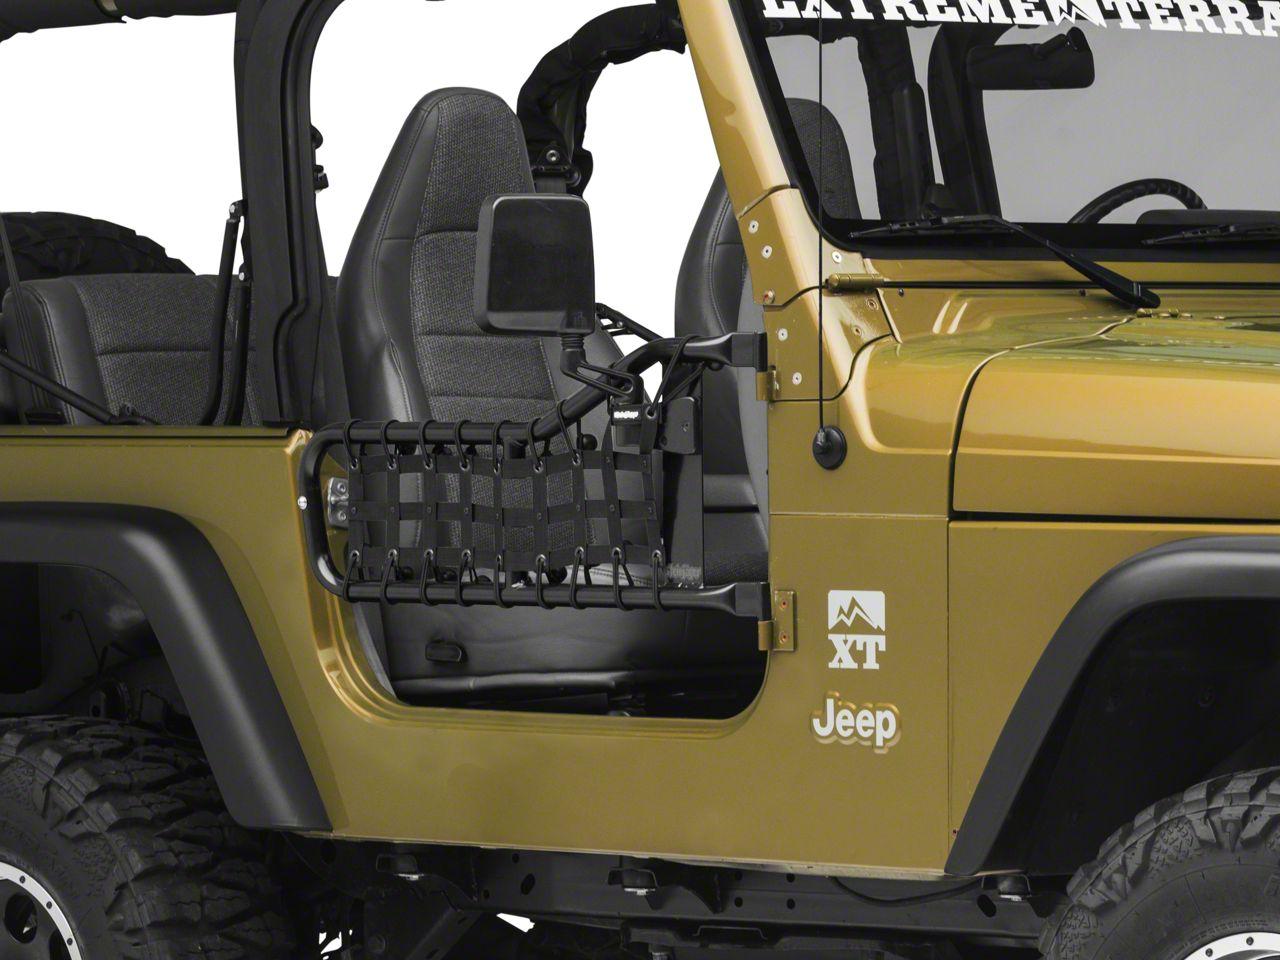 Steinjager Tube Door Cargo Net Covers - Black (97-06 Jeep Wrangler TJ)